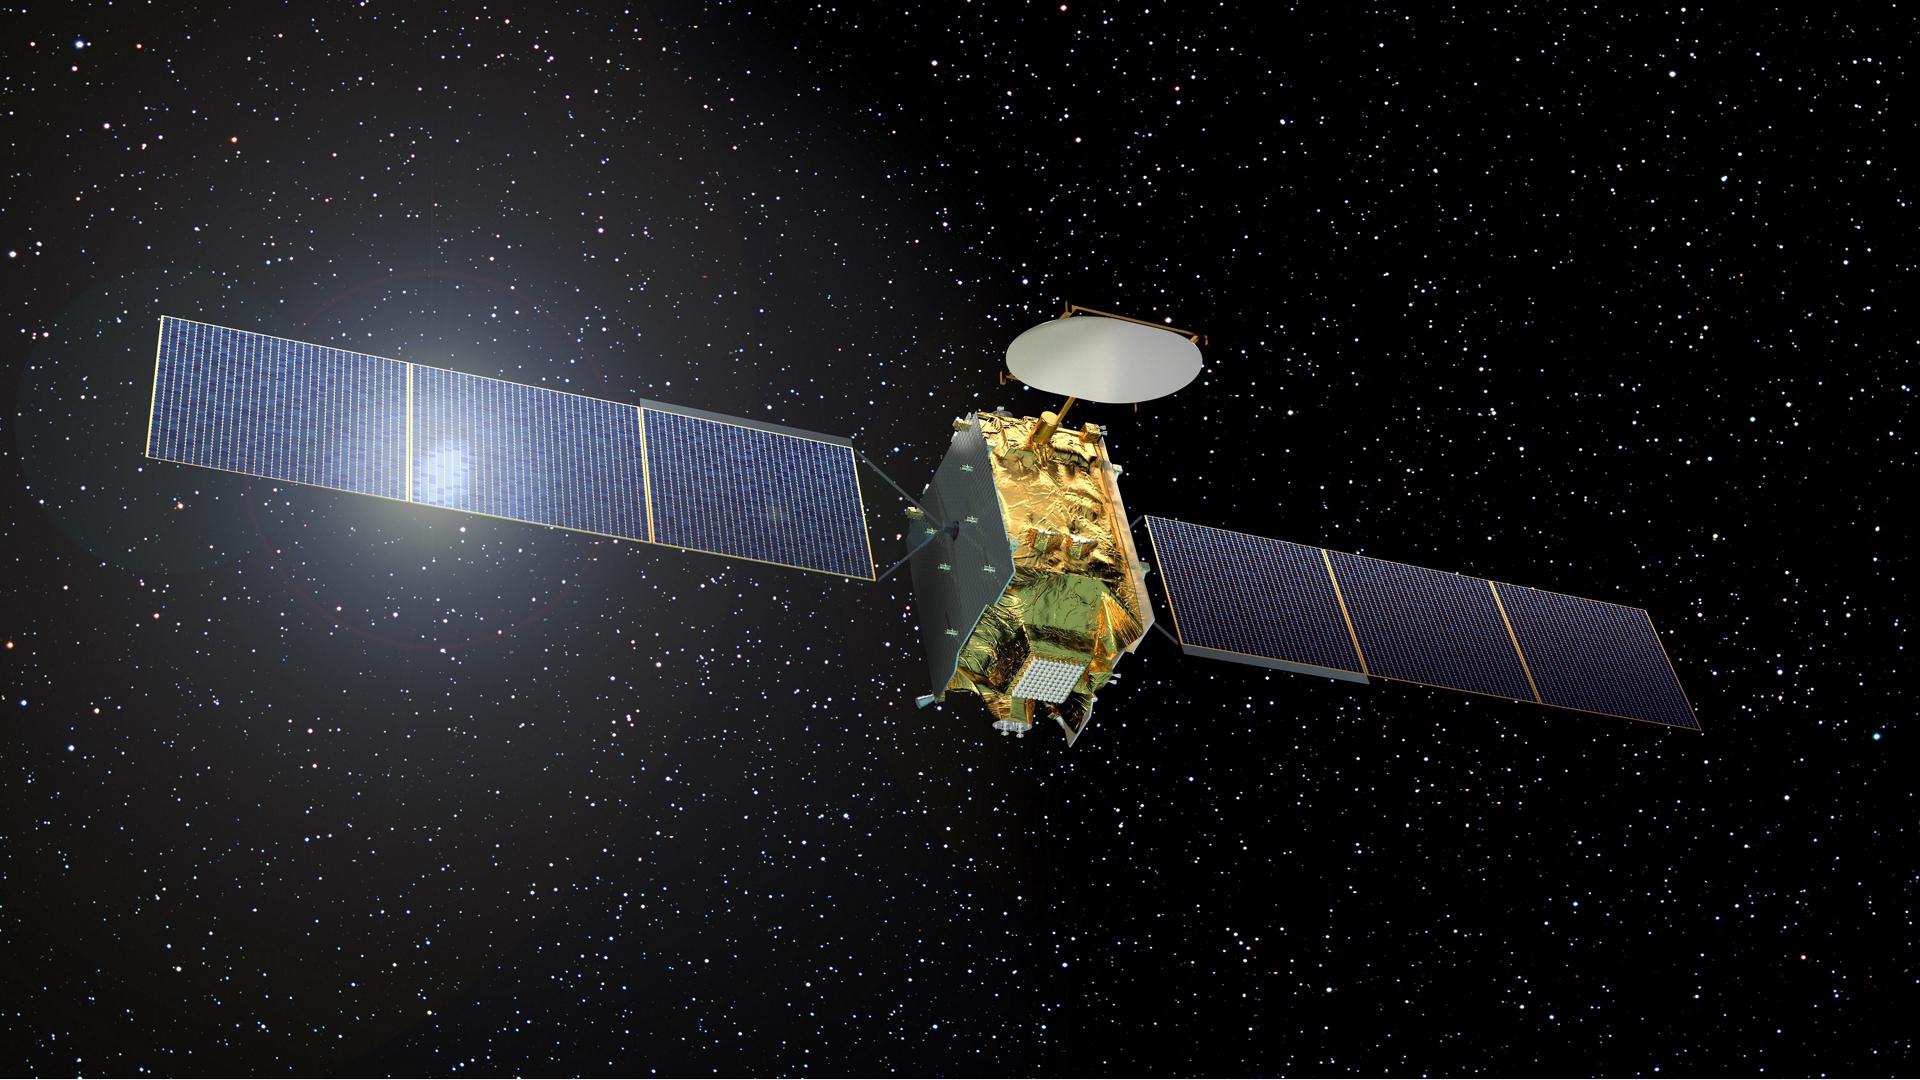 spacecraft and satellite - photo #29